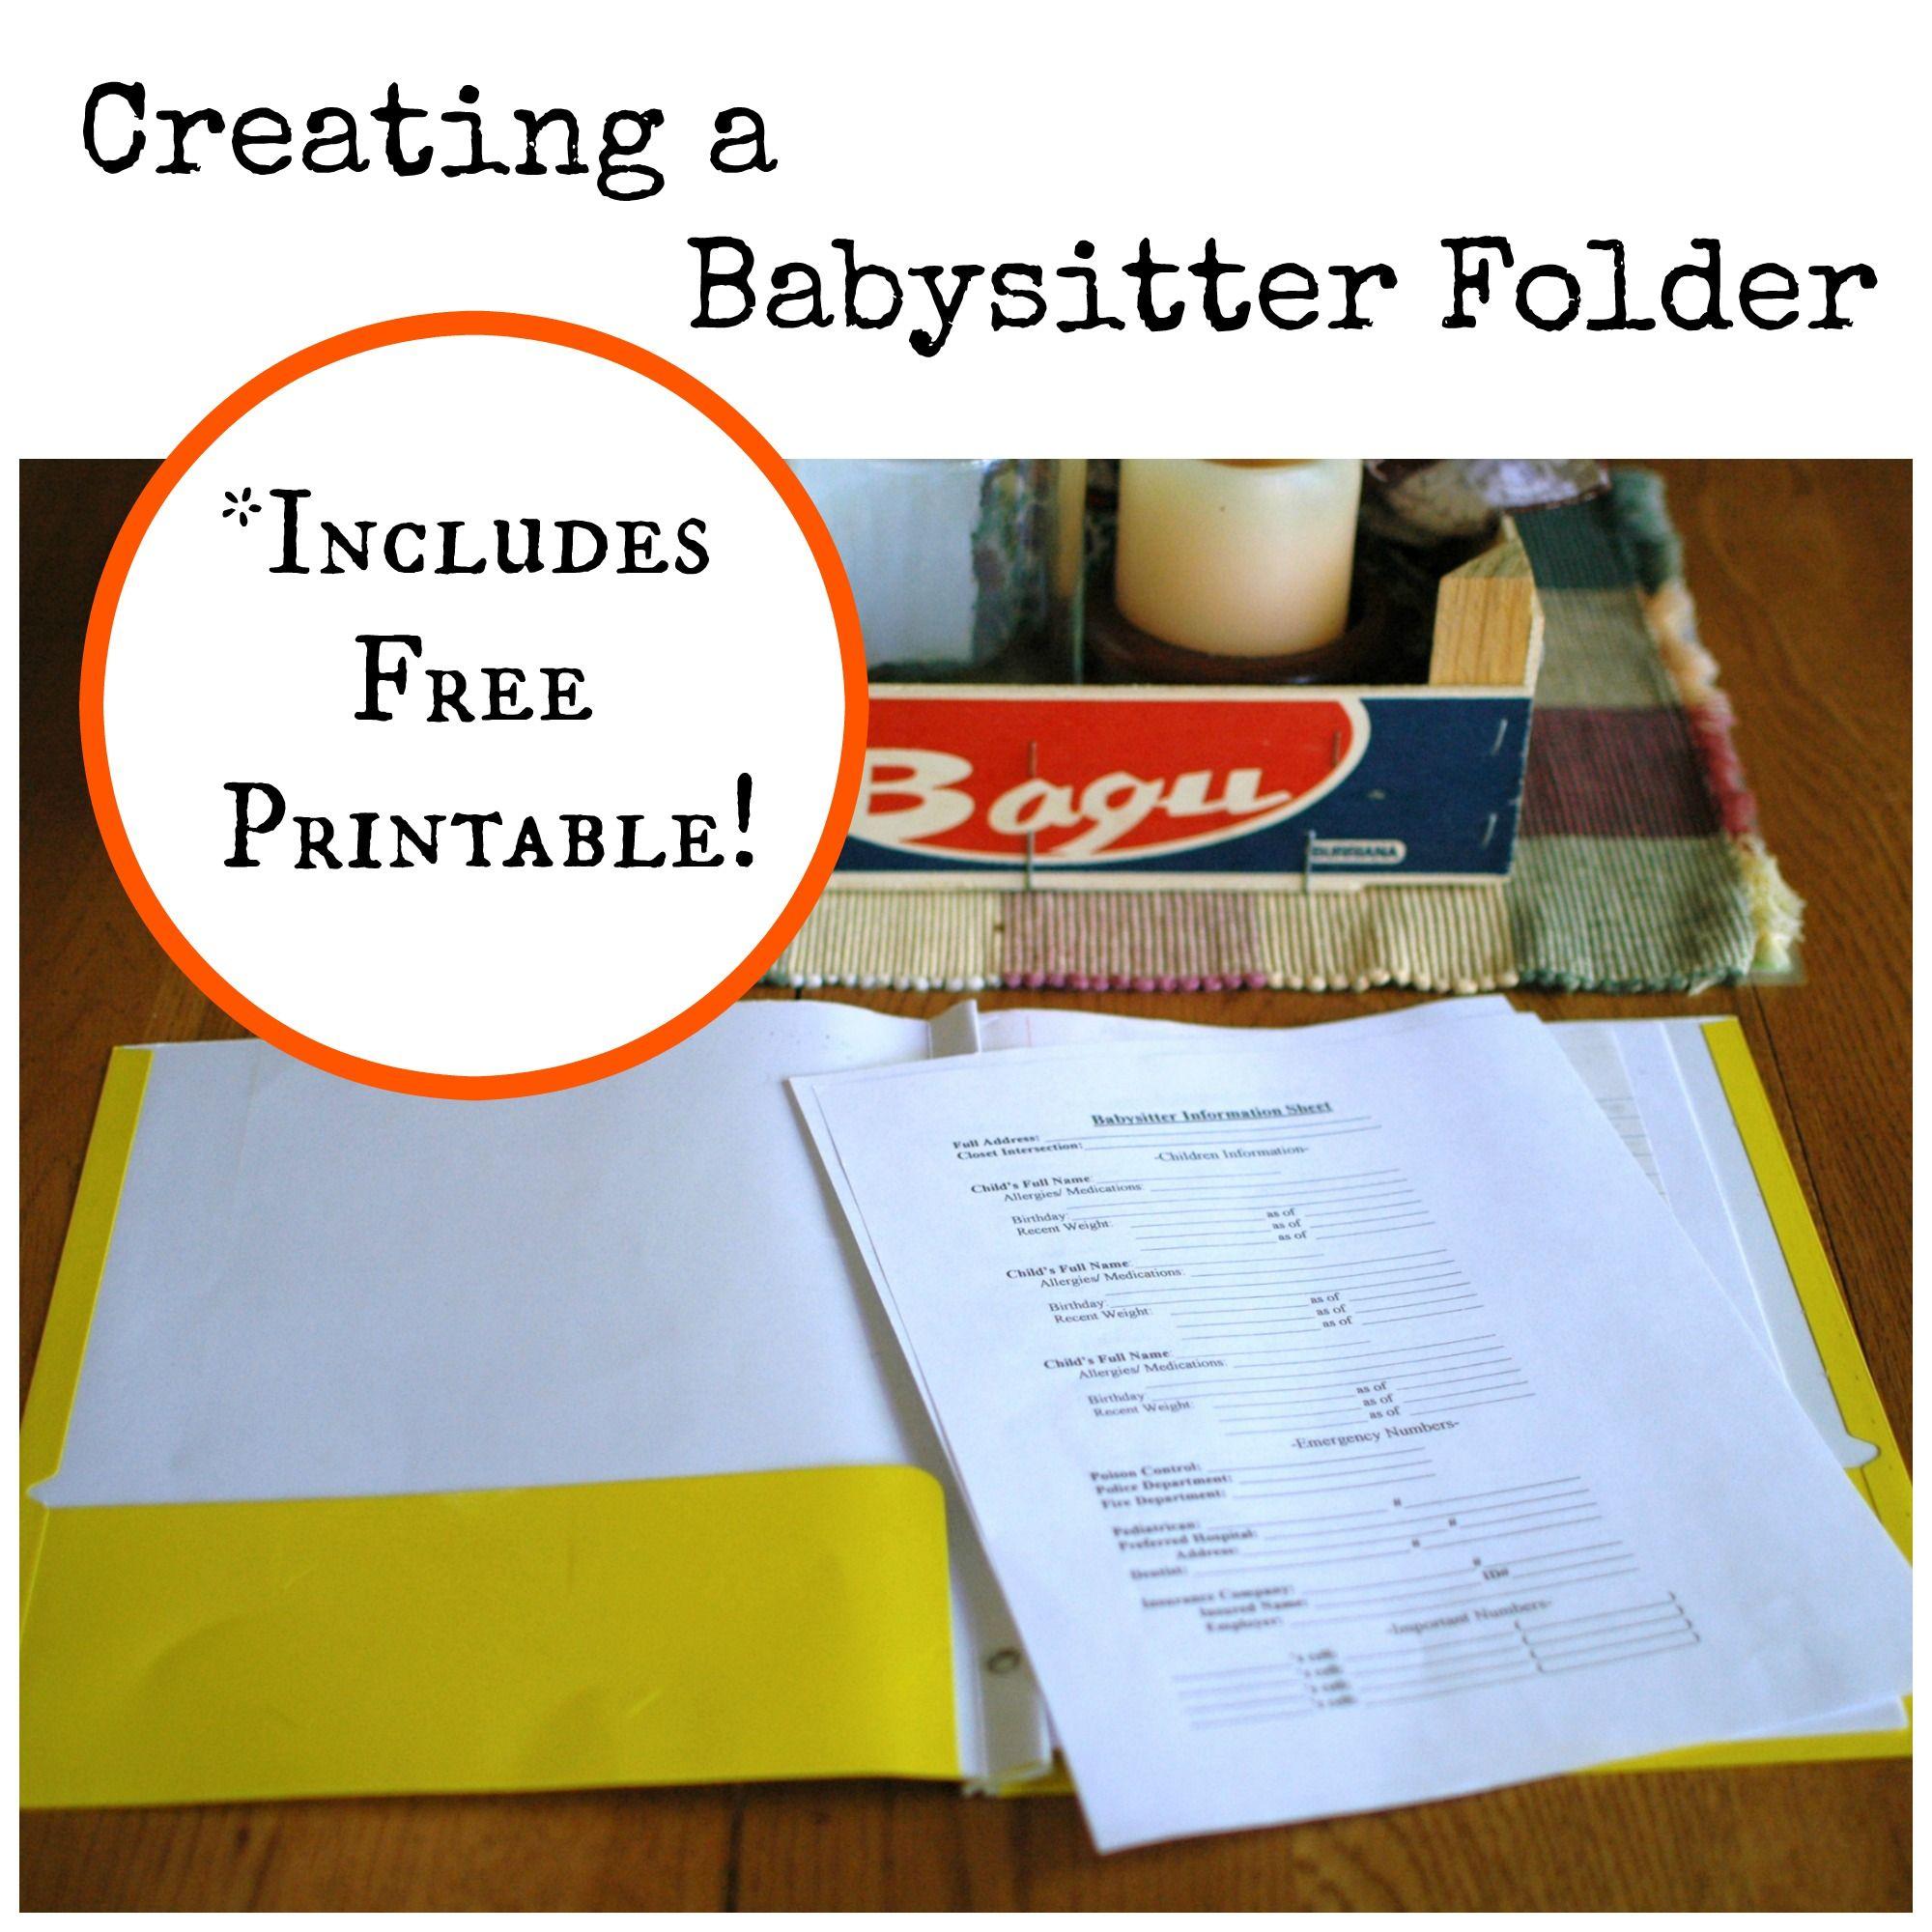 Creating A Babysitter Folder Free Printable Babysitter Free Printables Babysitting Jobs